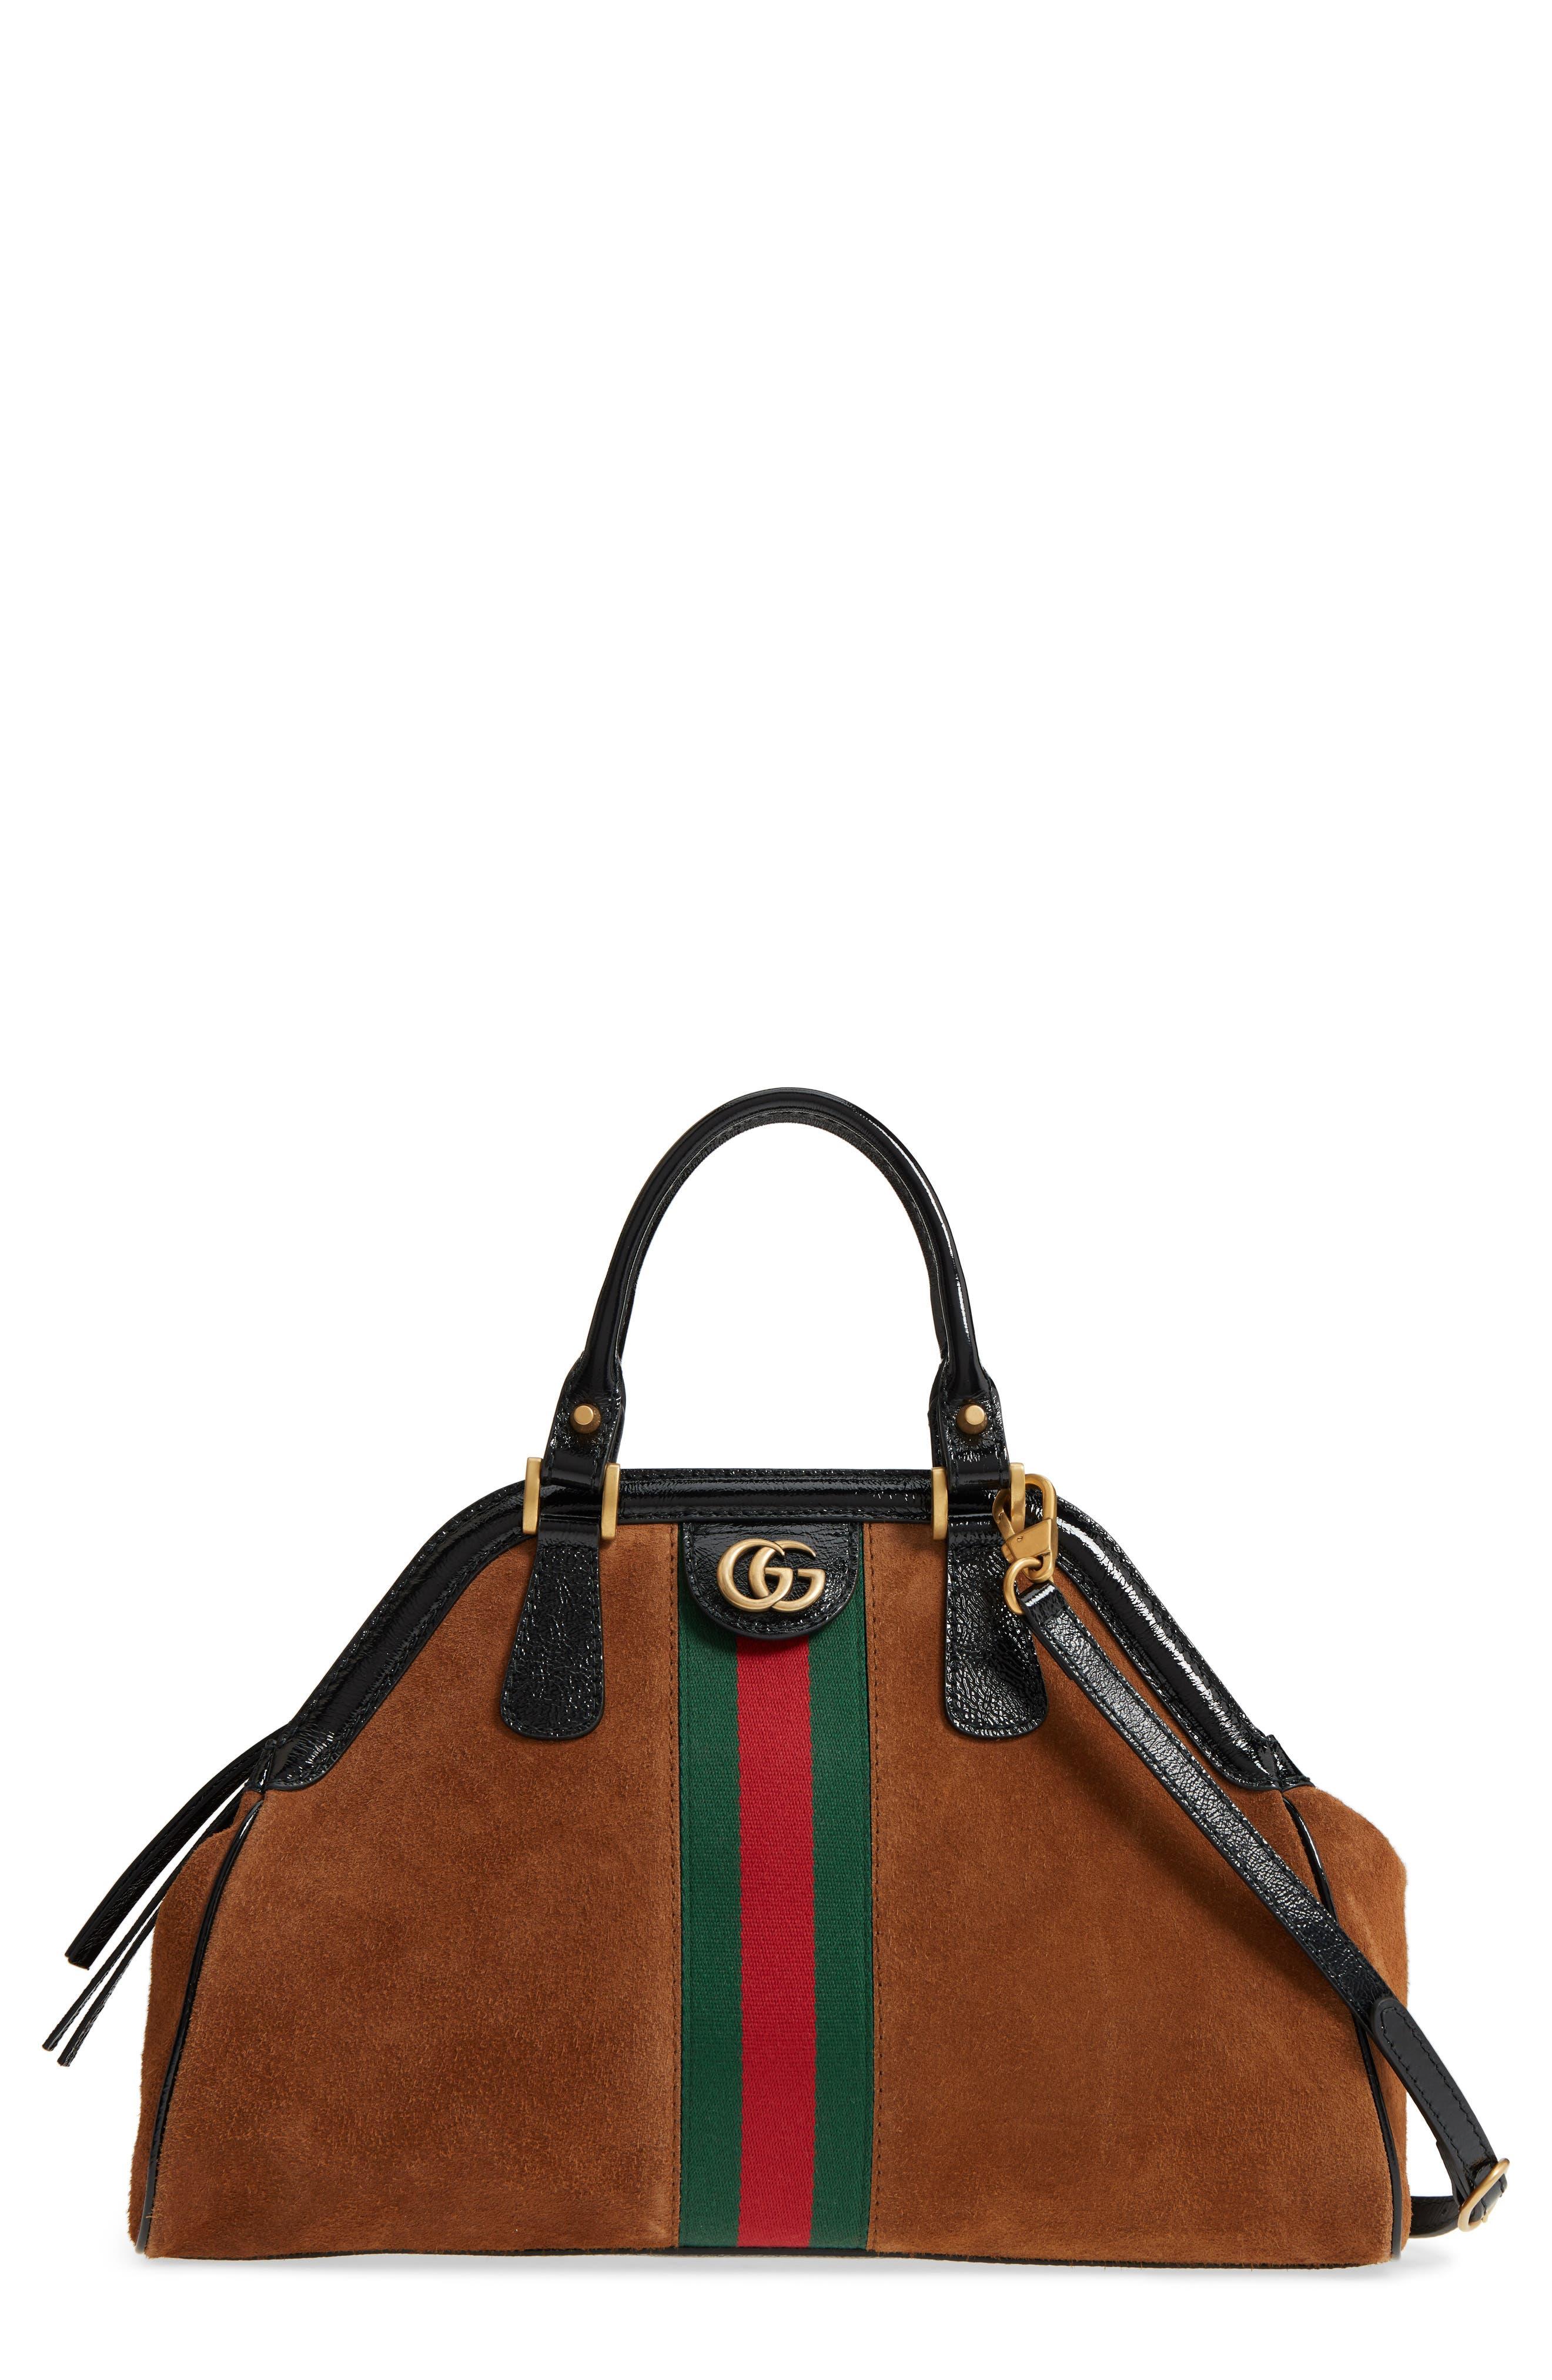 Gucci Medium RE(BELLE) Suede Satchel